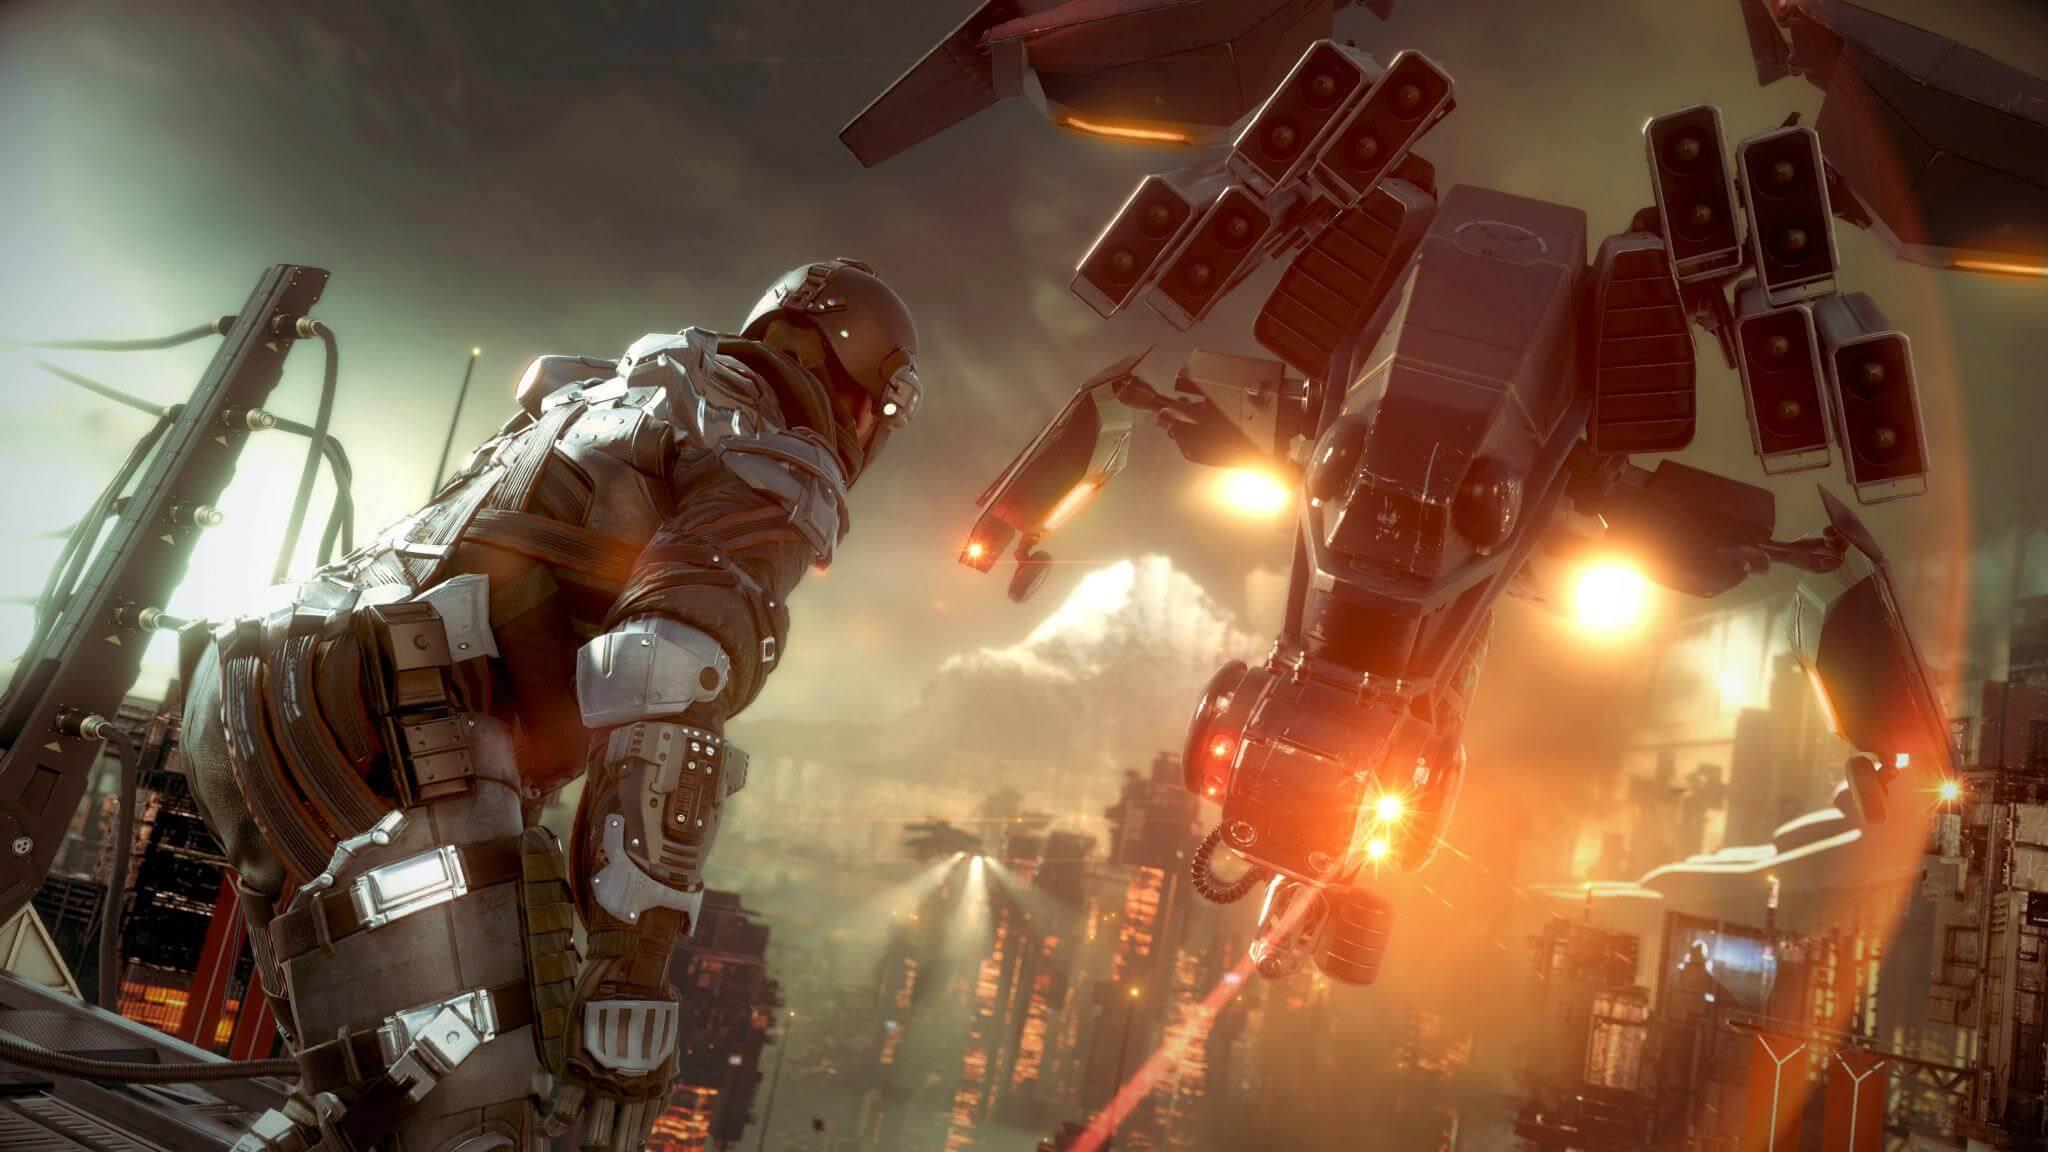 'Killzone: Shadow Fall' Story Trailer; Guerilla Games on New Main Character